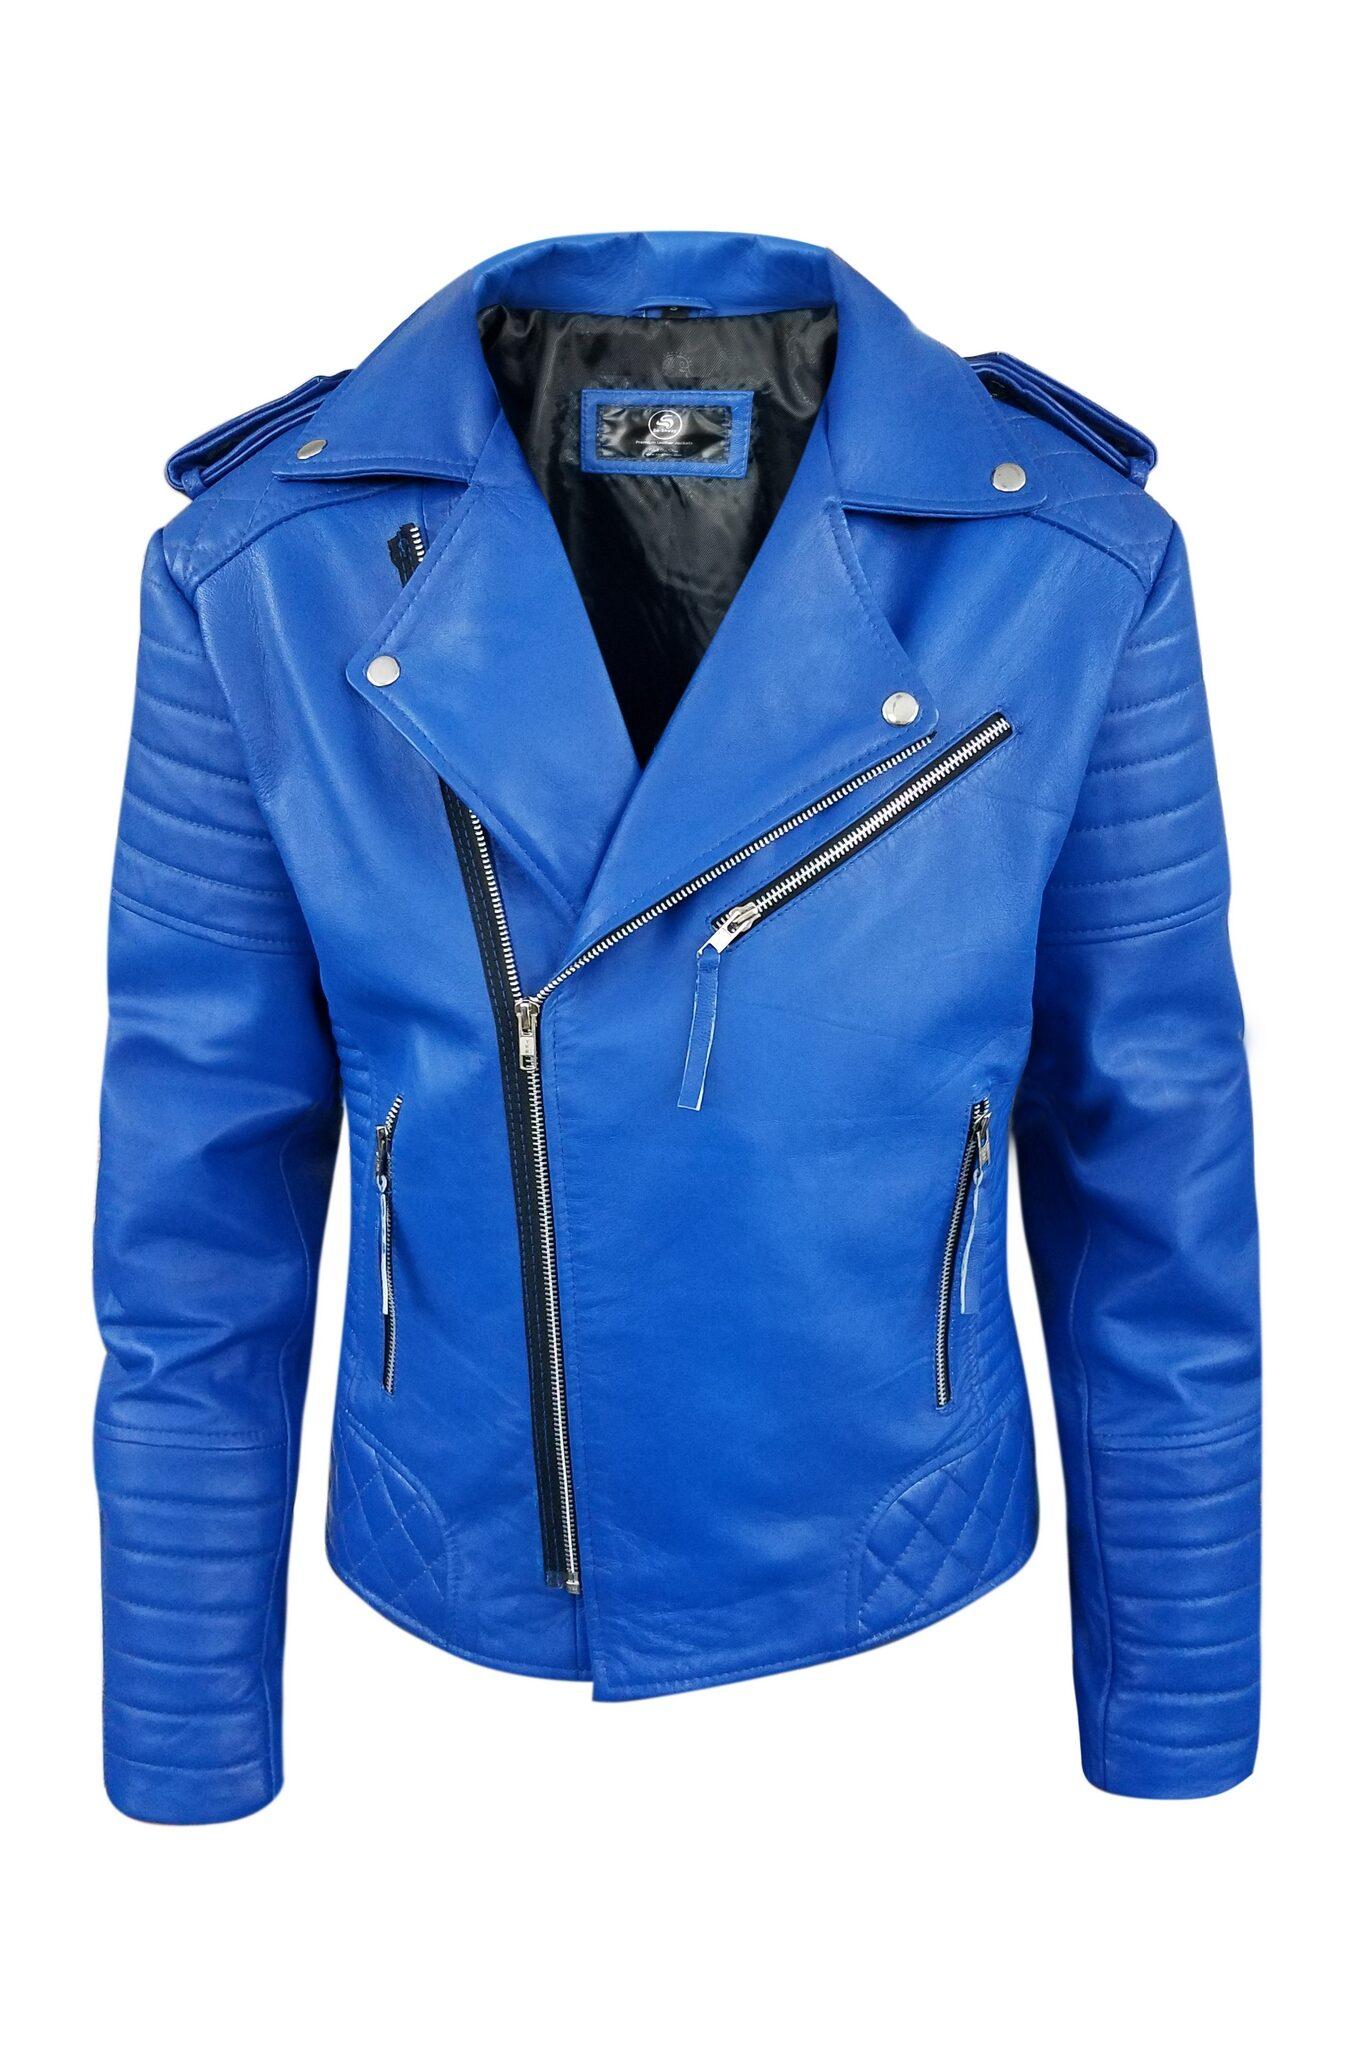 Brando Blue Biker Genuine Motorcycle Leather Jacket For Mens-8